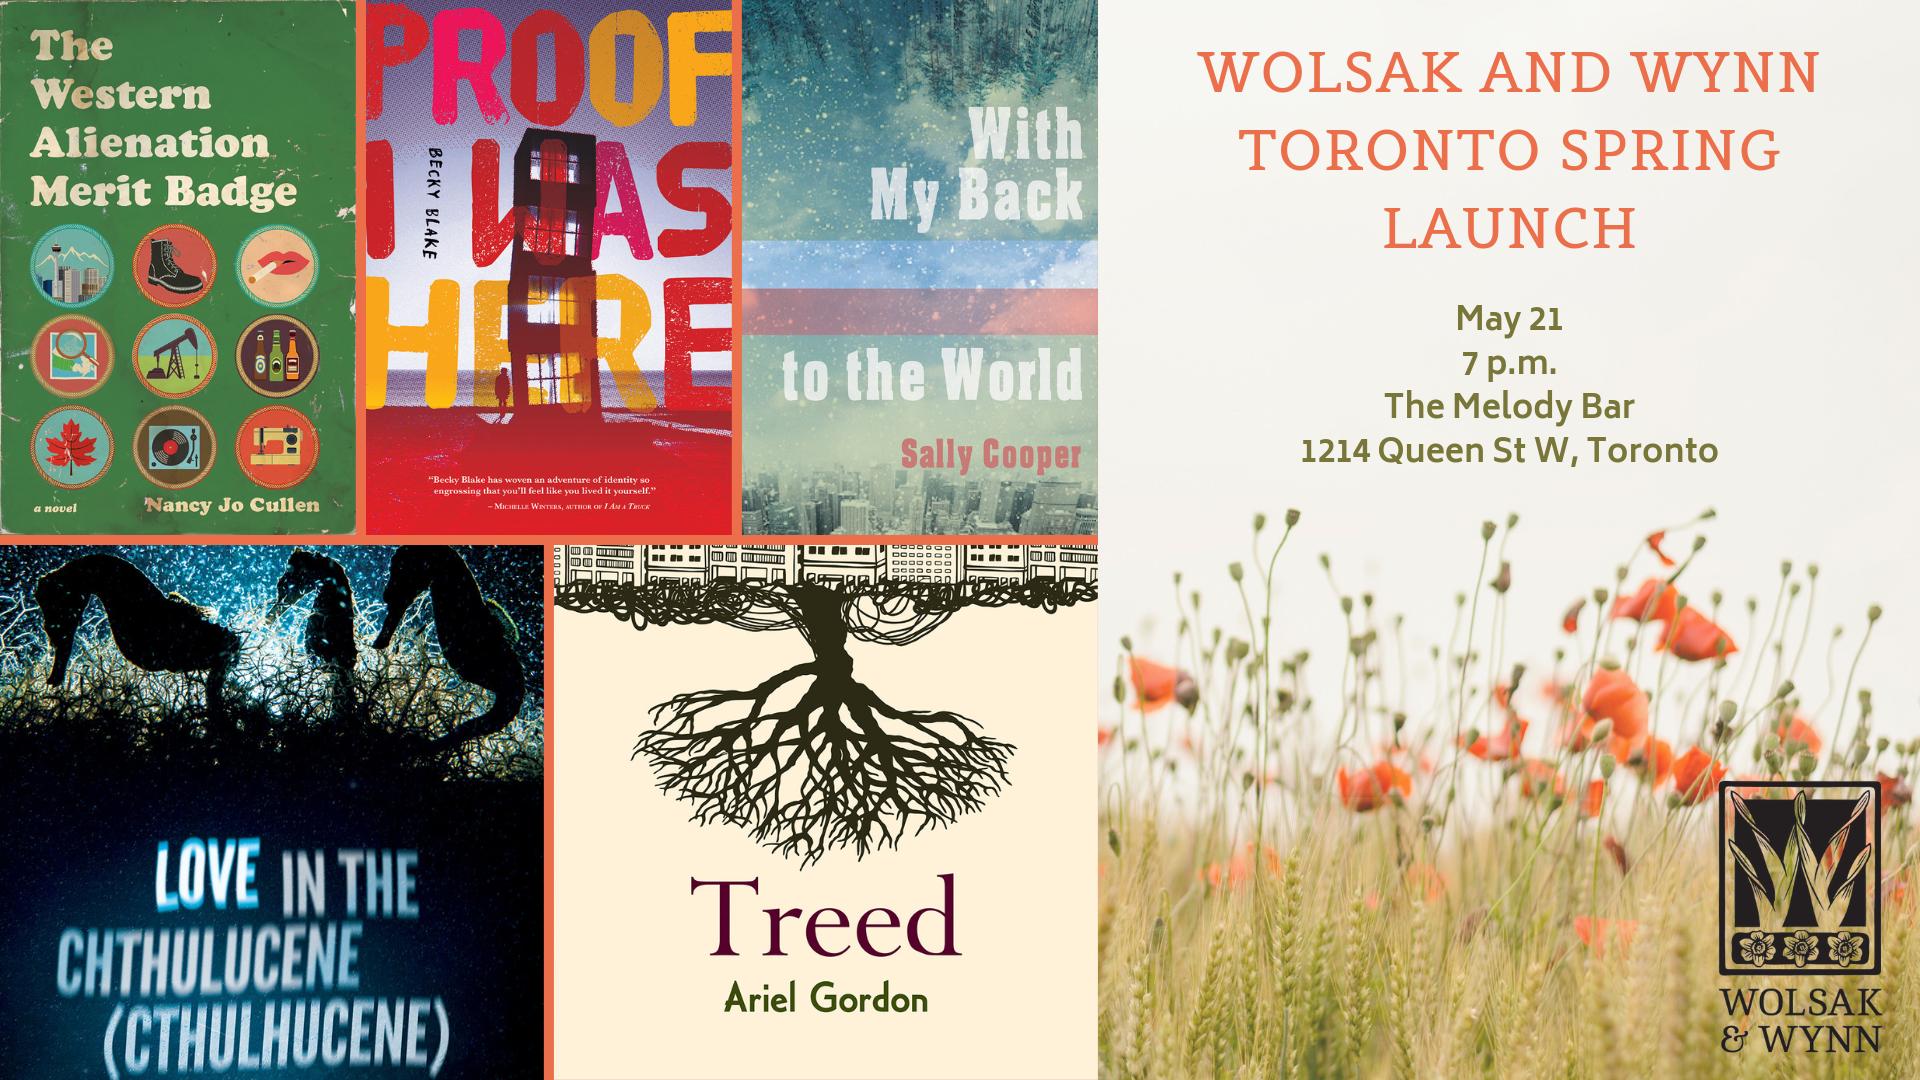 2019 spring toronto WOLSAK AND WYNN SPRING LAUNCH 2019 (1).png